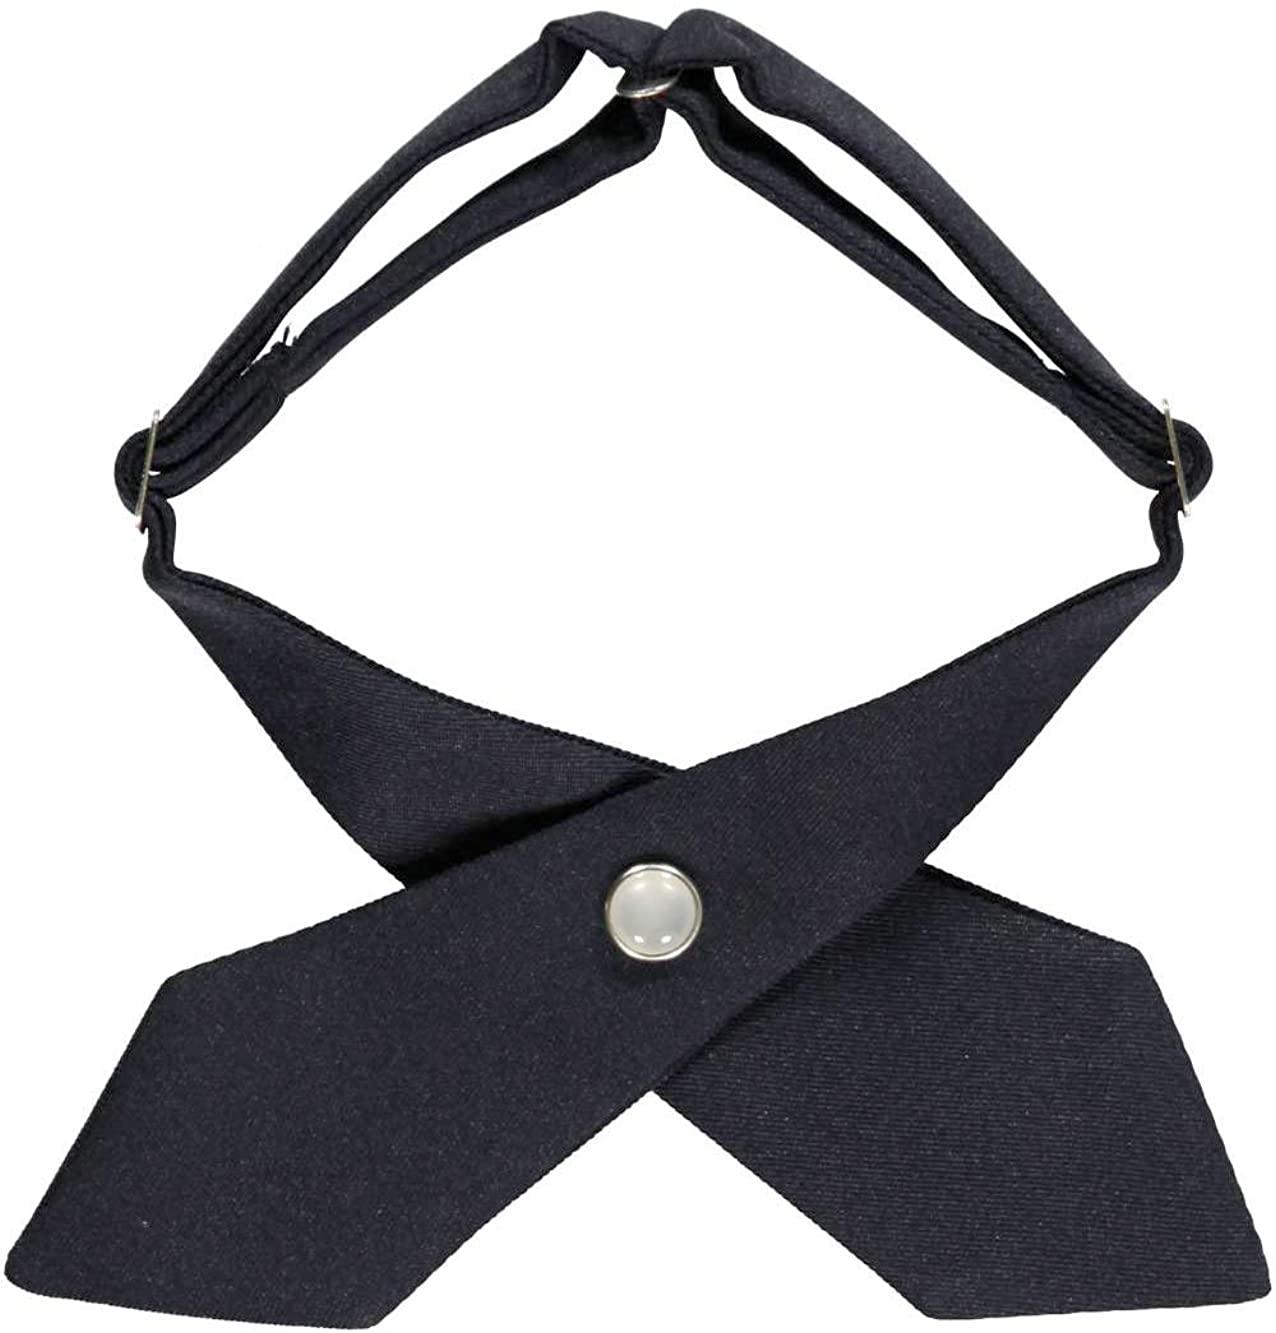 French Toast Crisscross Necktie